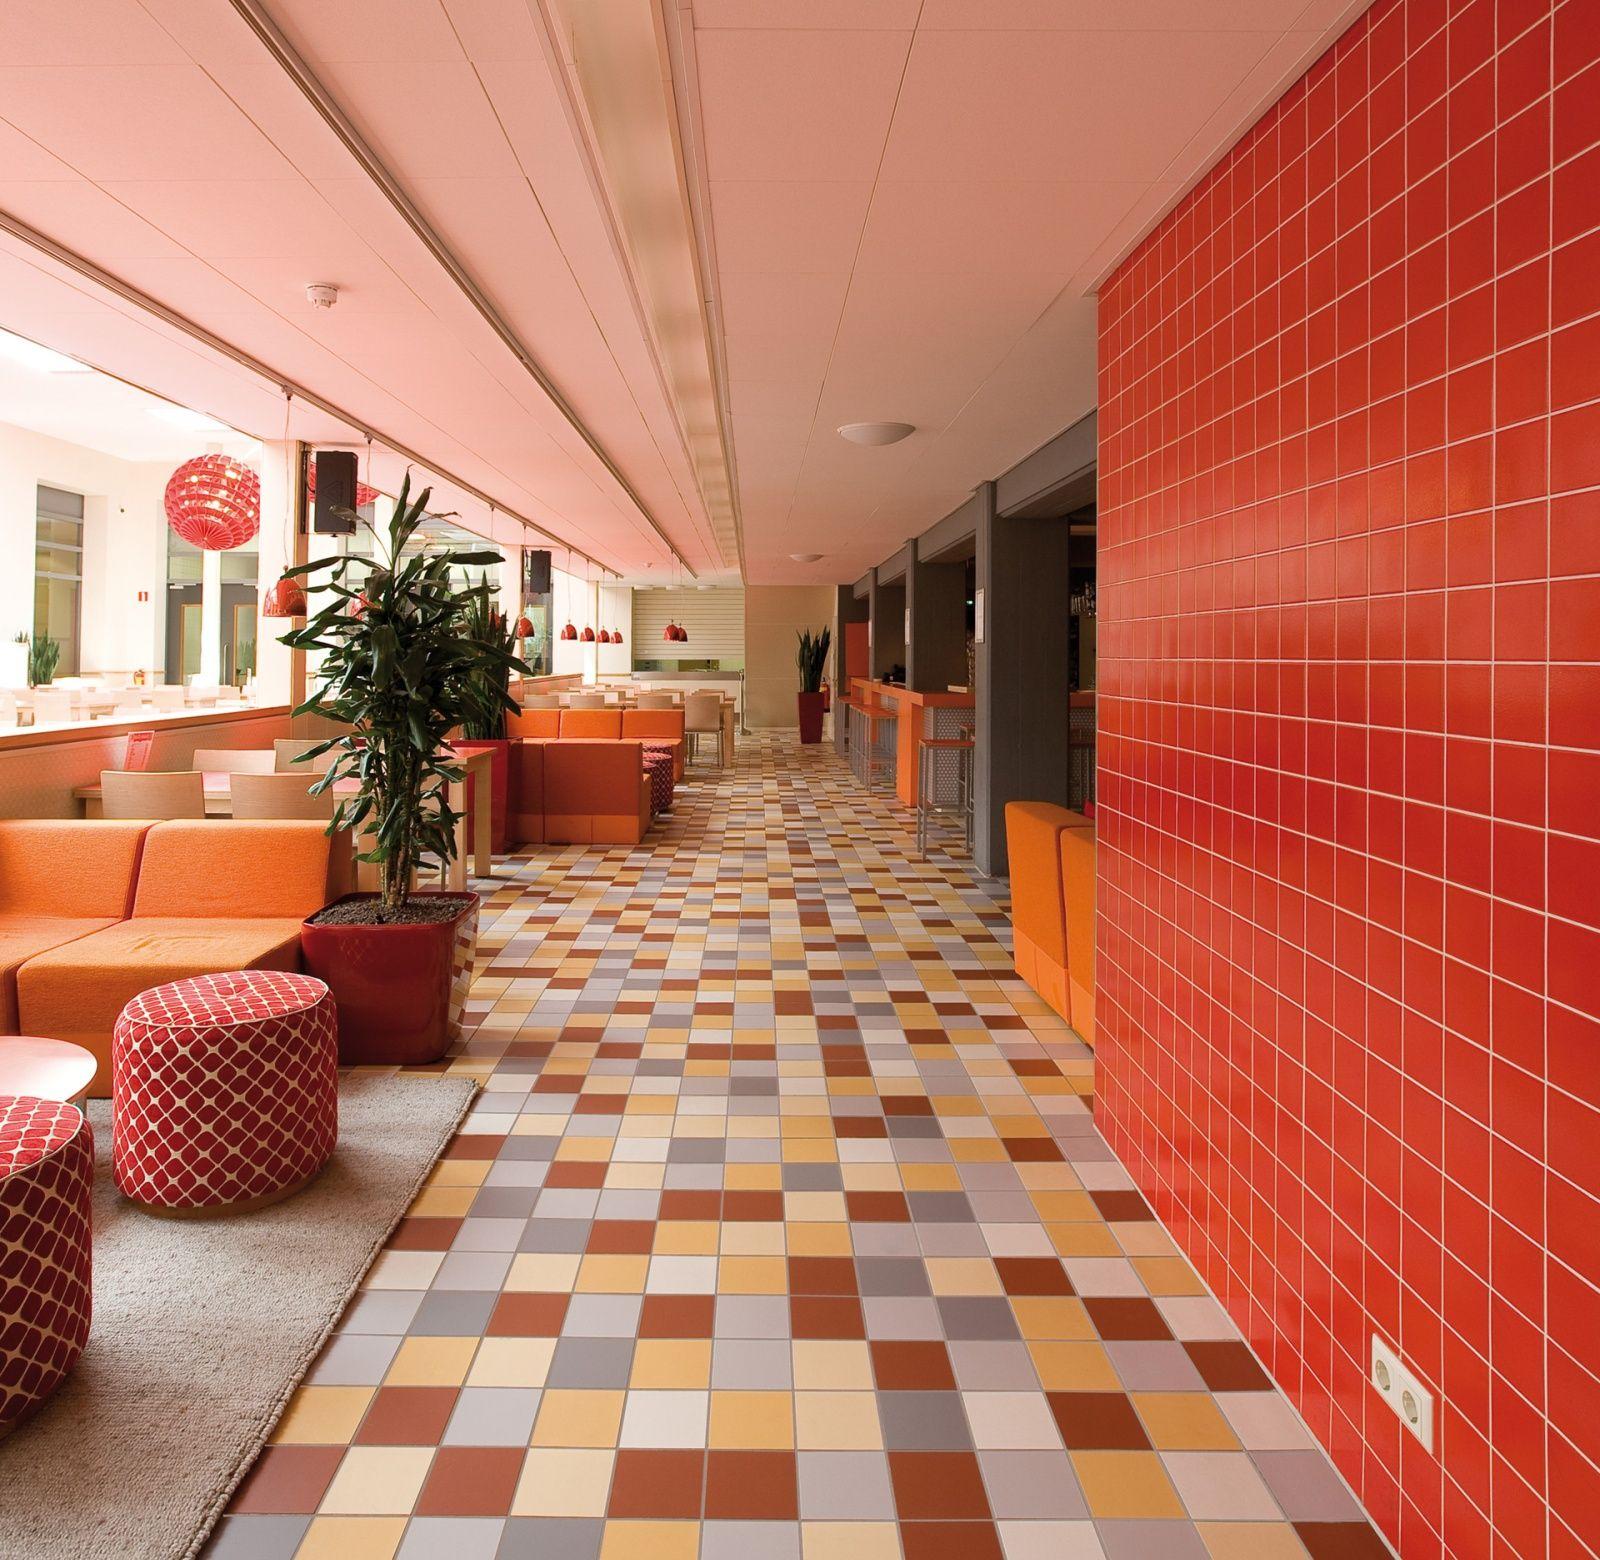 Mosa Com Rf0252 Stayokay Amsterdam Nl Mosa Mosatiles Tiles Ceramics Floortiles Interior Inspiration Design Dutchd In 2020 Design Dutch Design Retail Design